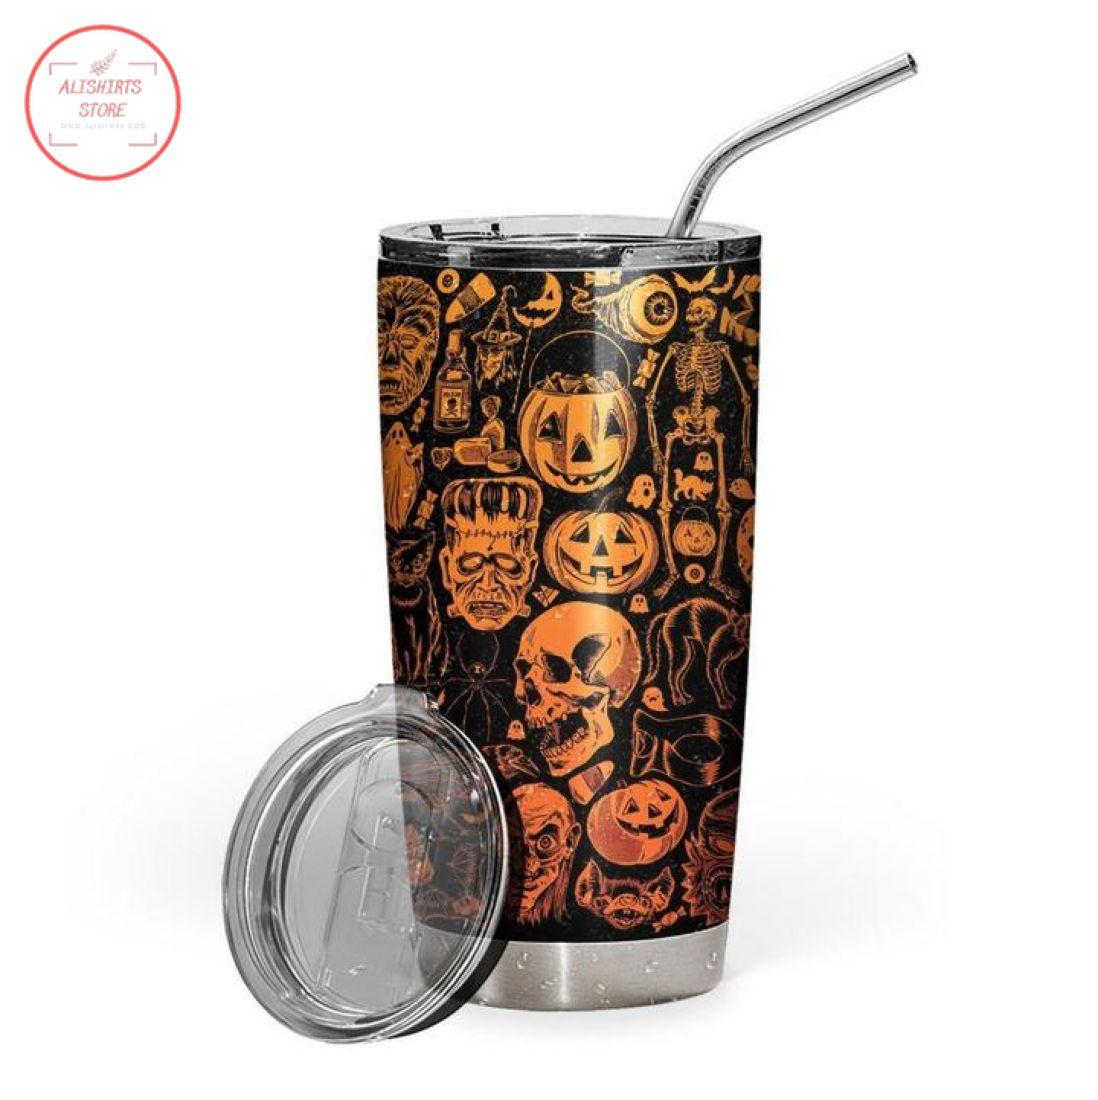 3D Everyday Is Halloween Skull Pumpkin Stainless Steel Tumbler